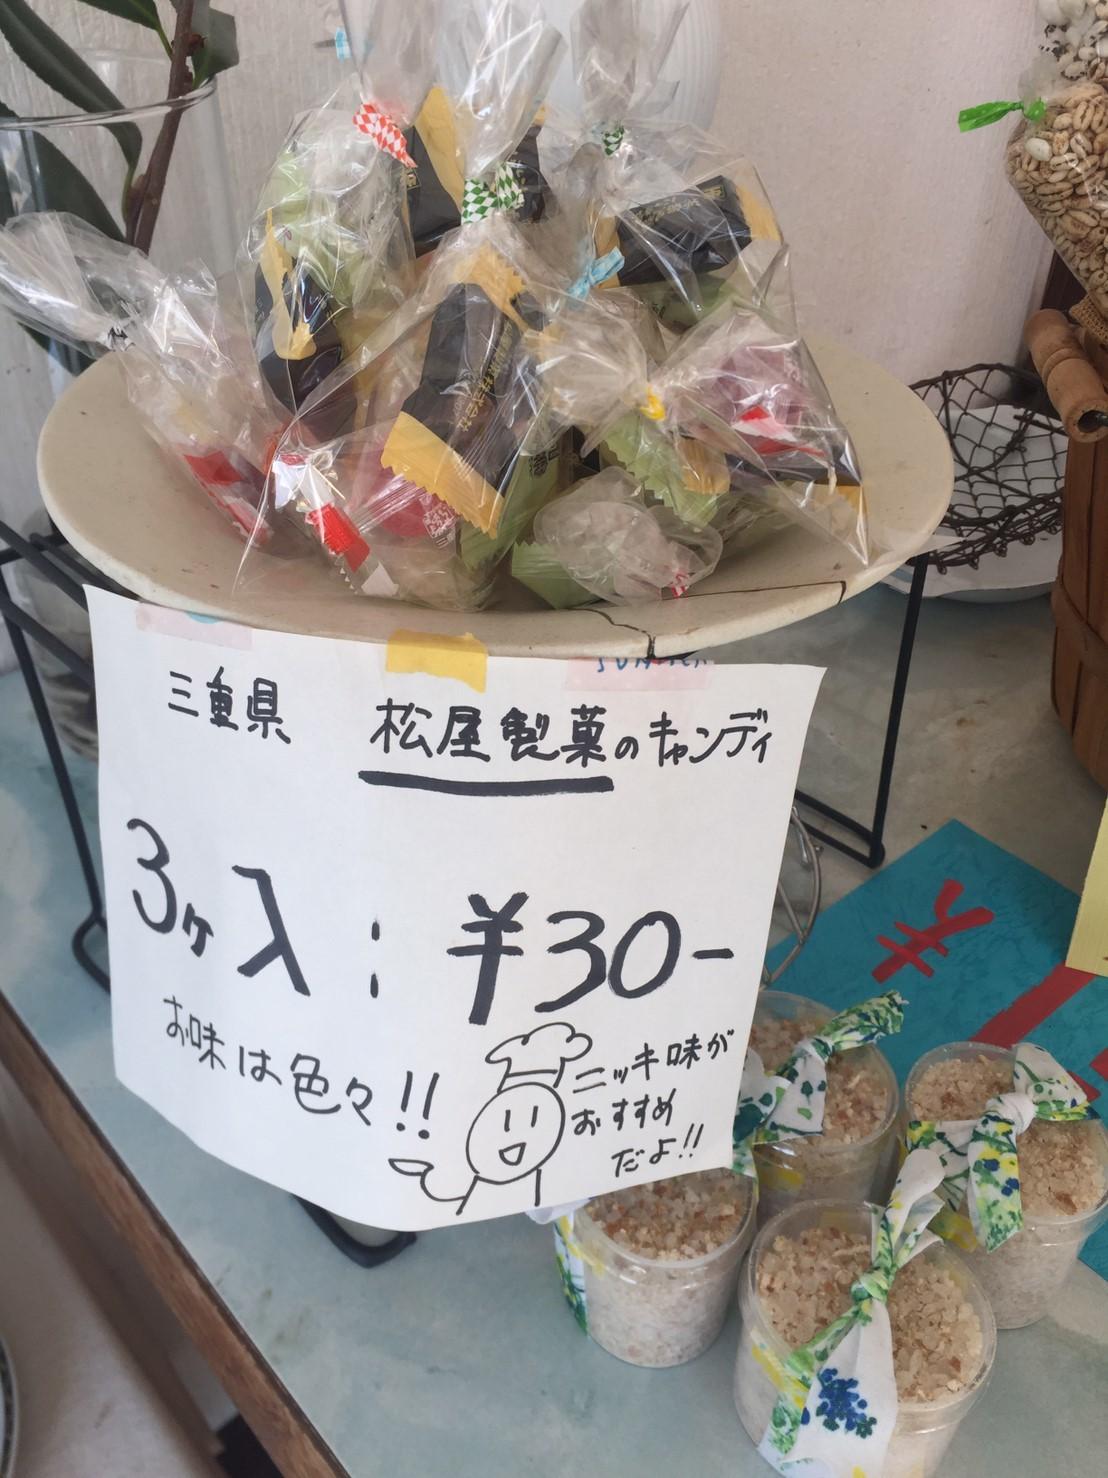 Tottori カルマ  カルマ焼飯_e0115904_22095742.jpg